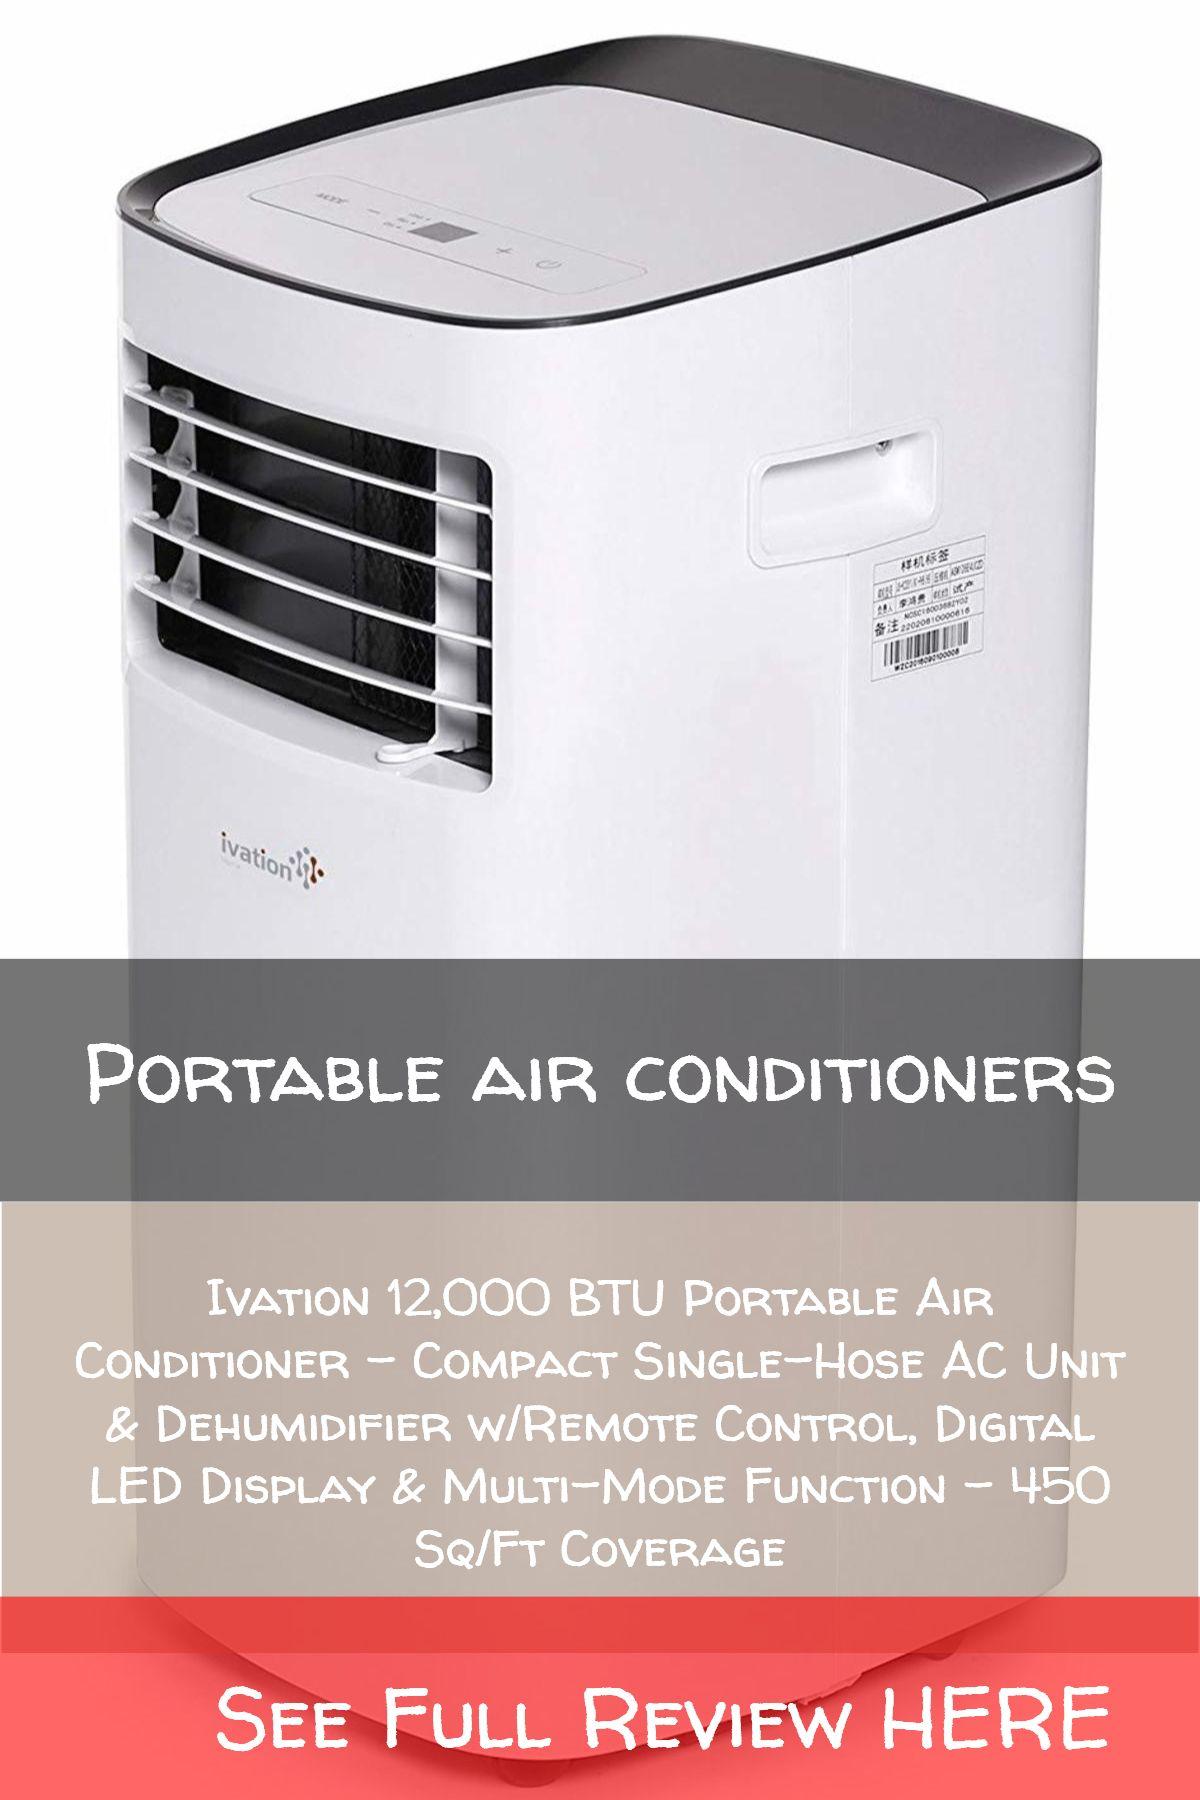 Portable Air Conditioners Ivation 12 000 Btu Portable Air Conditioner Compact Single Hose Ac Unit Dehumidi Ac Units The Unit Dehumidifiers